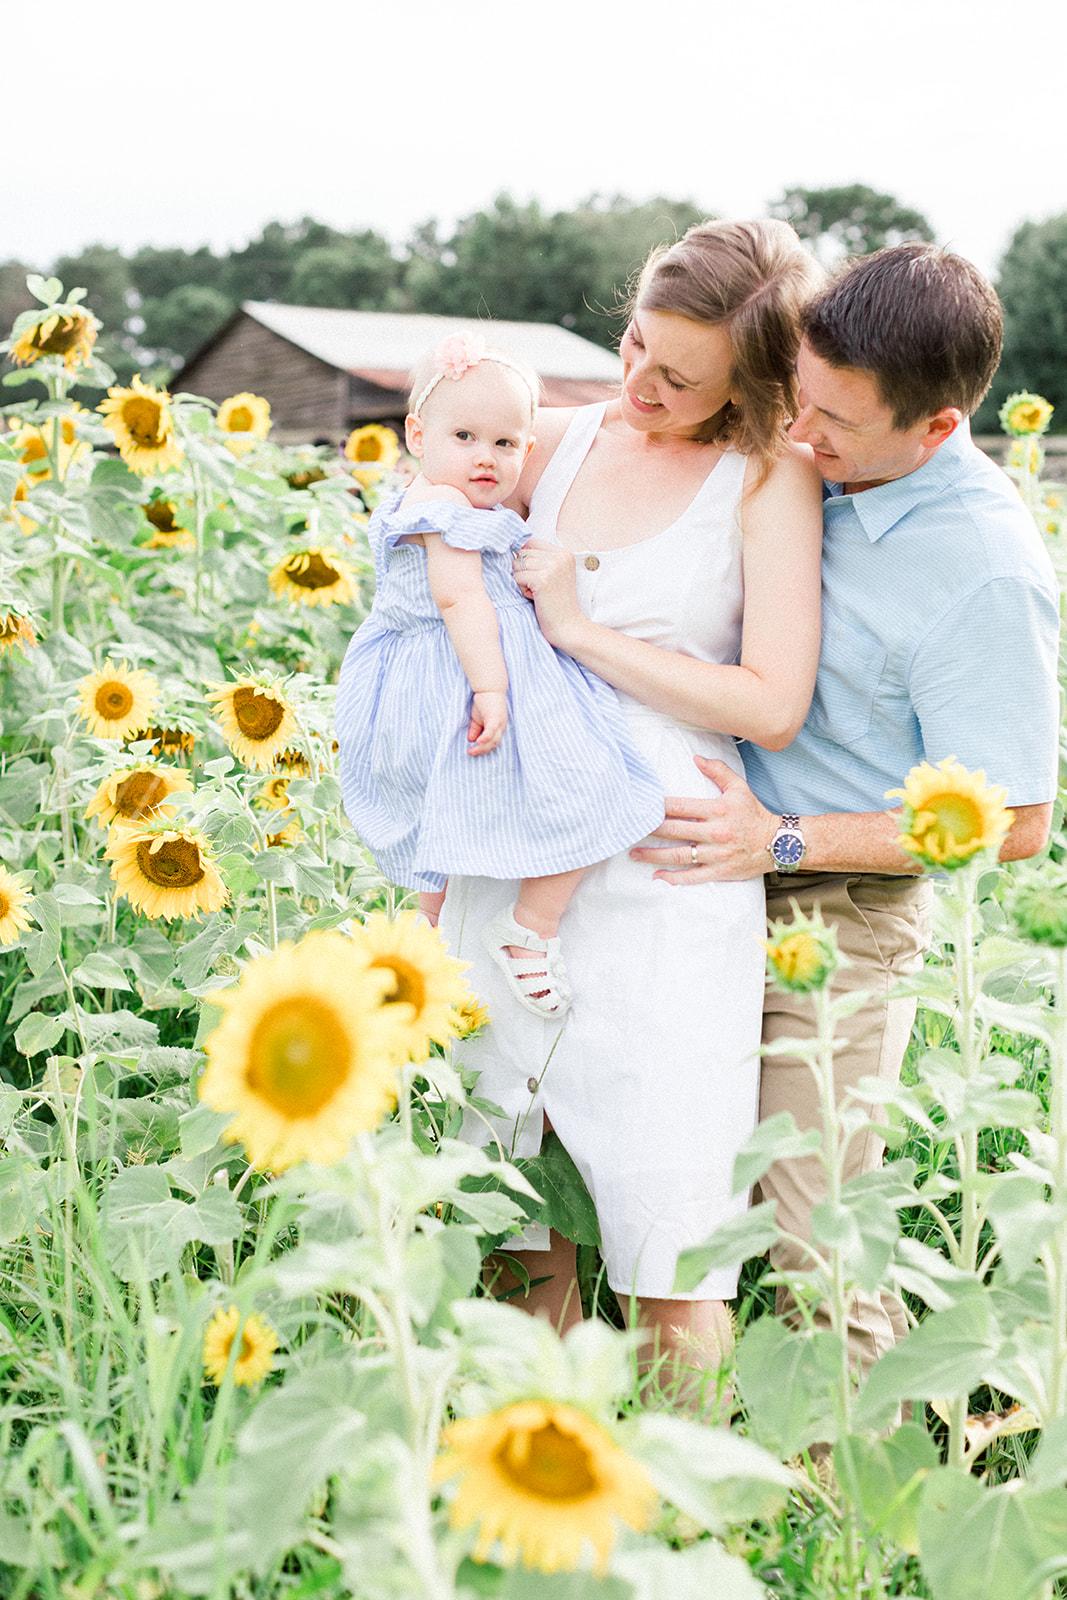 Four_Corners_Photography_Ludvigsen_Finals_Sunflower_Farm_Mini-18.jpg